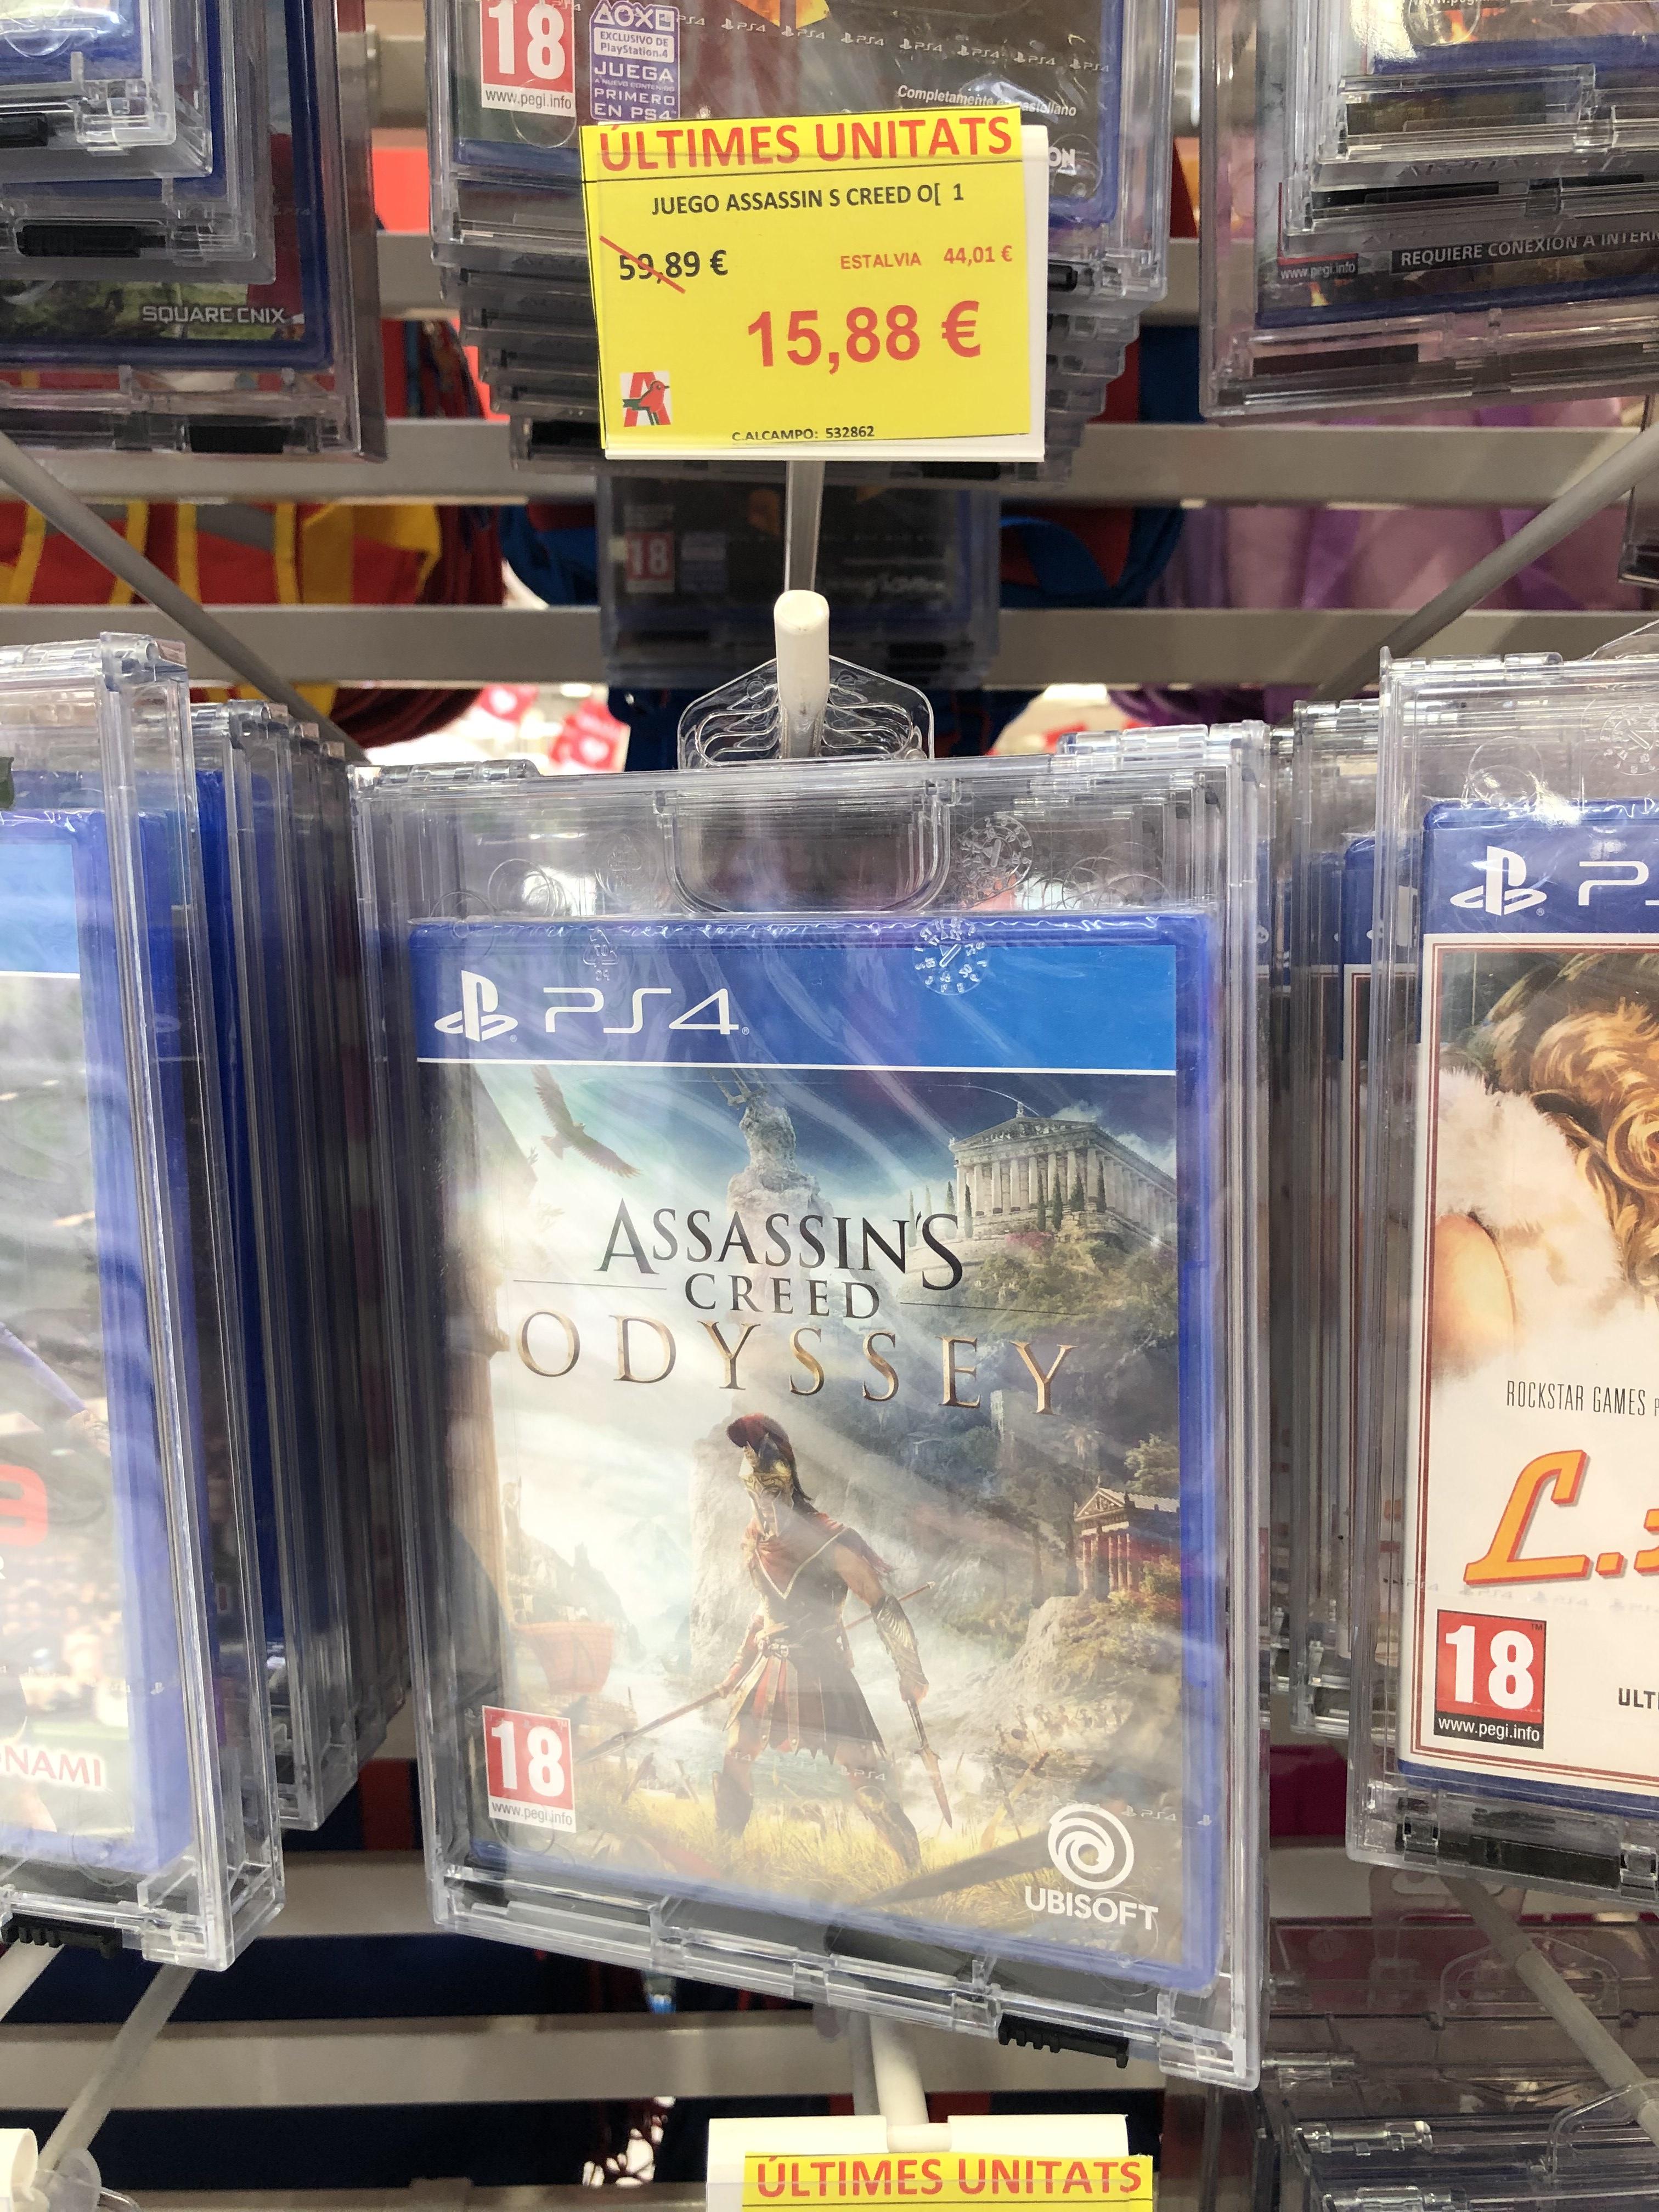 Assassin's Creed Odyssey PS4 - Alcampo Vilanova i la Geltrú